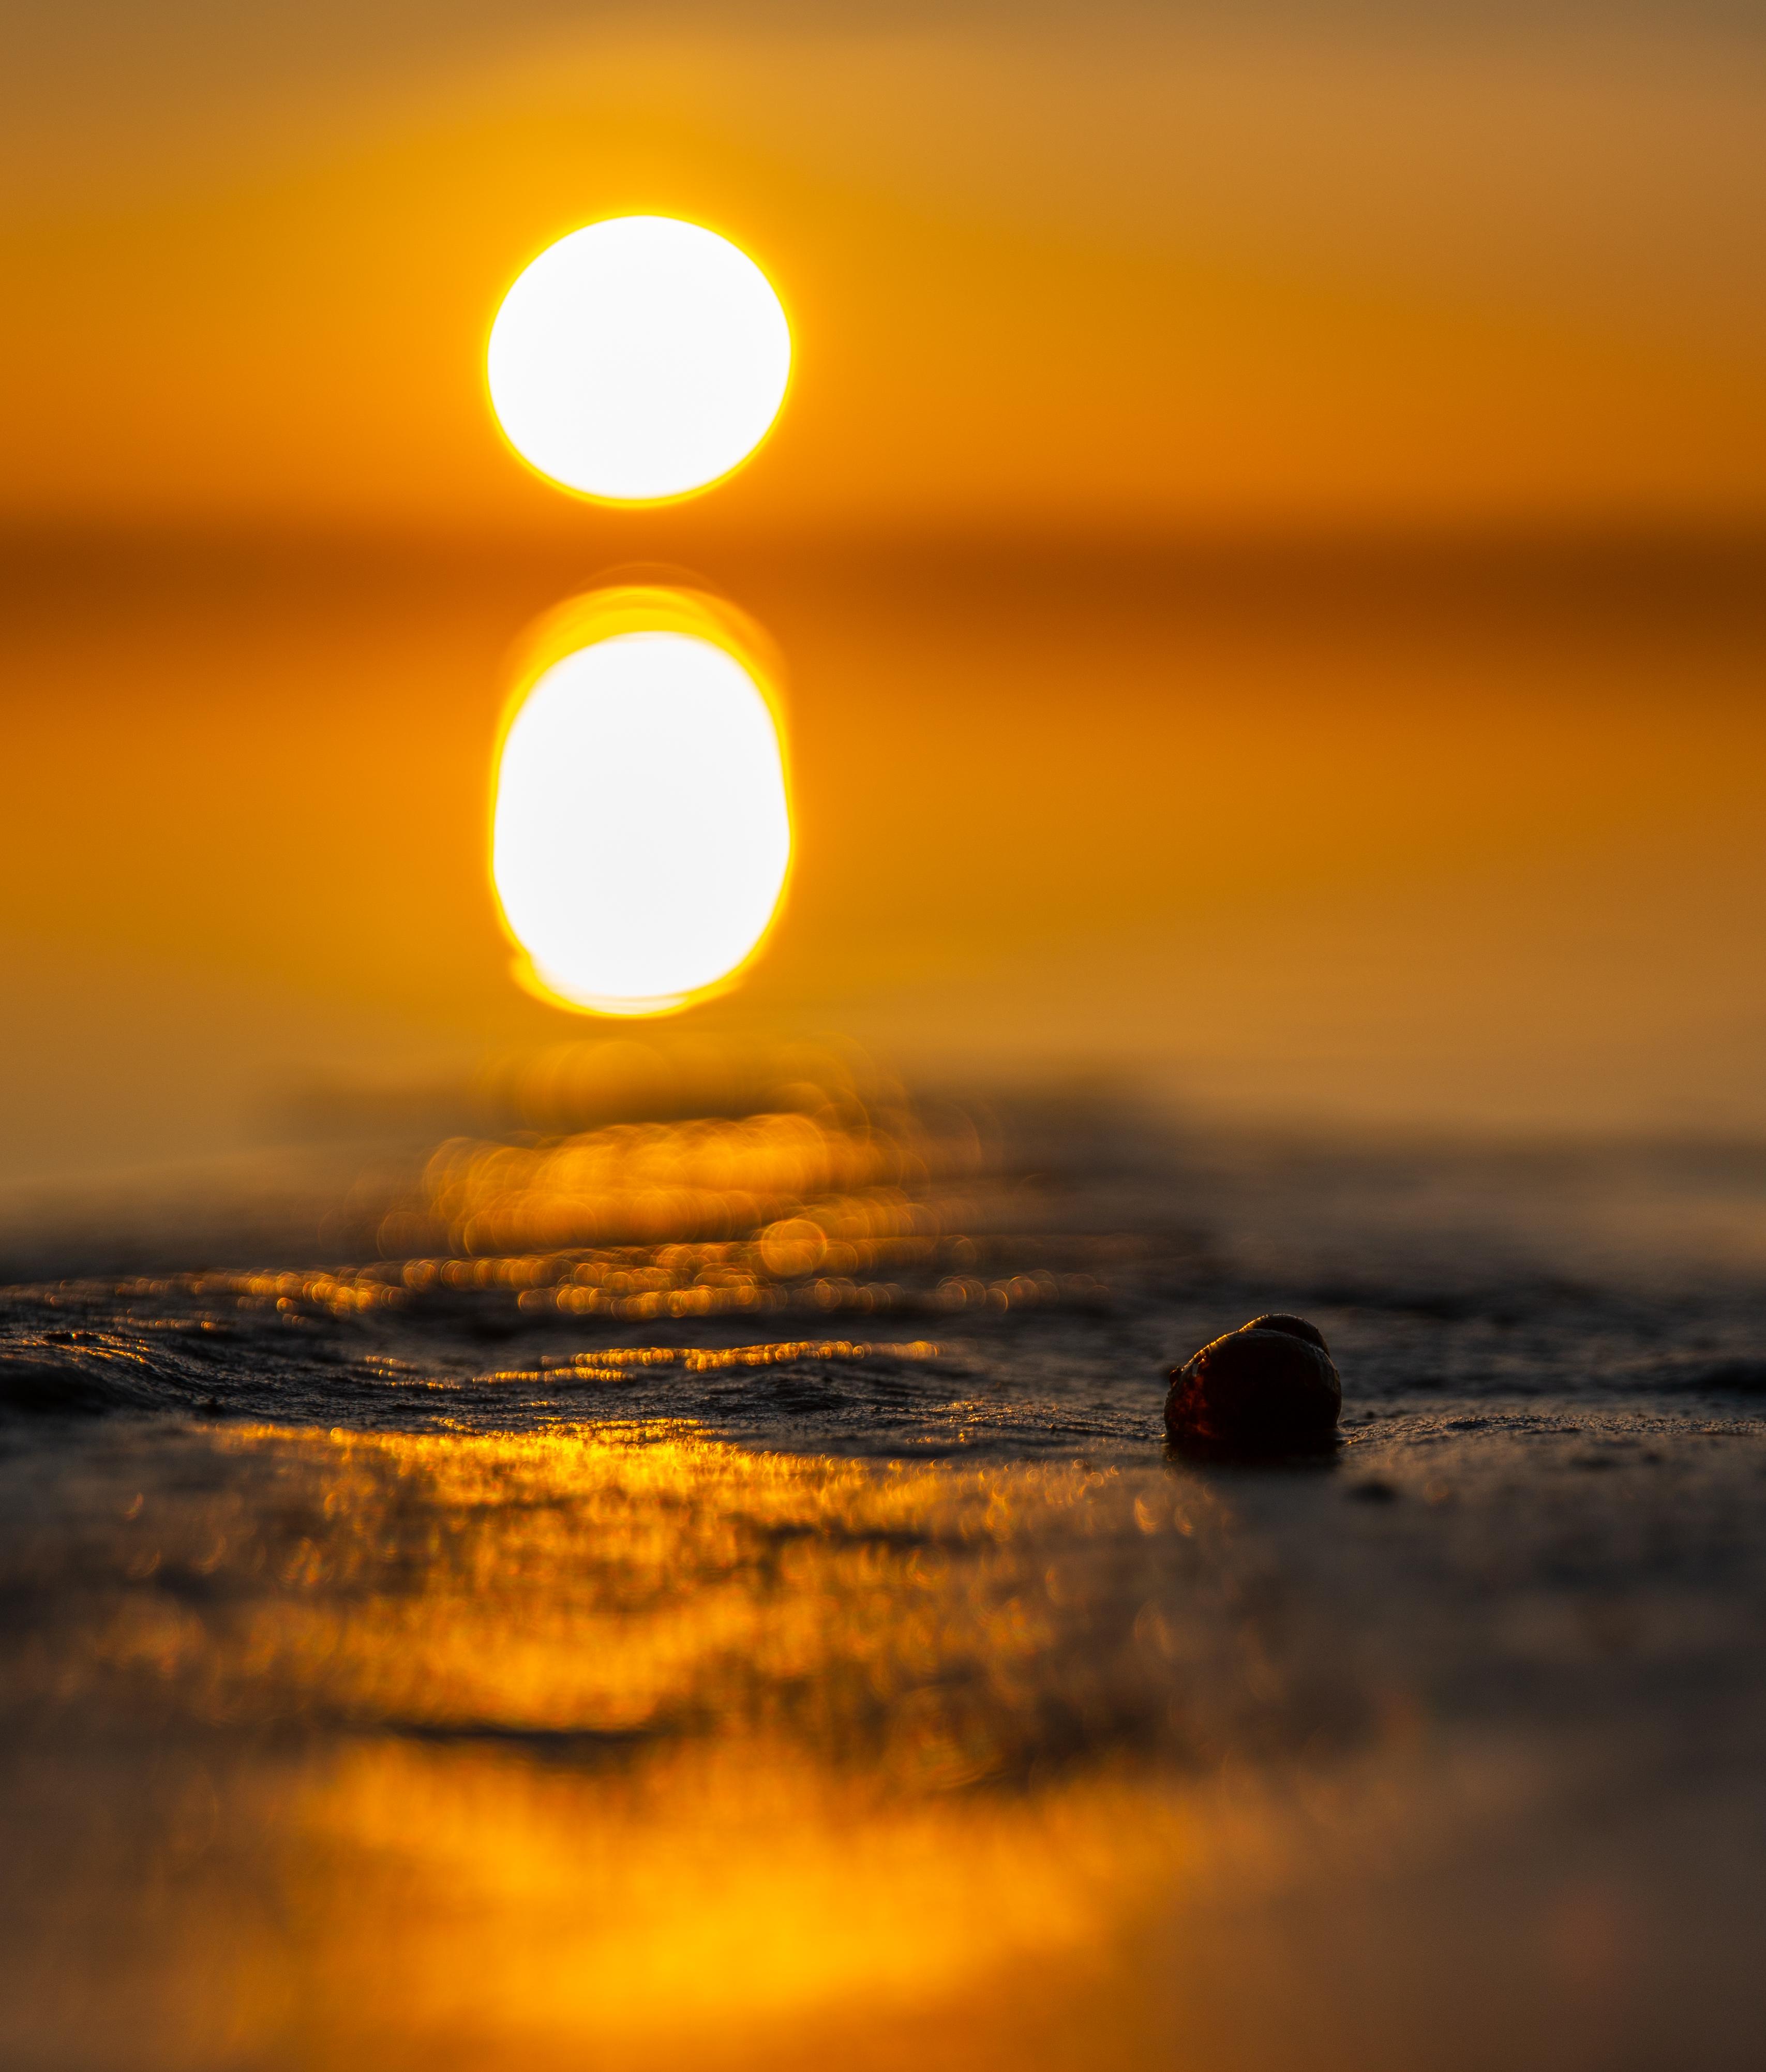 Free images sunset water shell sun horizon sunrise sky calm sunset water shell sun horizon sunrise sky calm atmosphere sea atmosphere of earth morning afterglow daytime altavistaventures Gallery